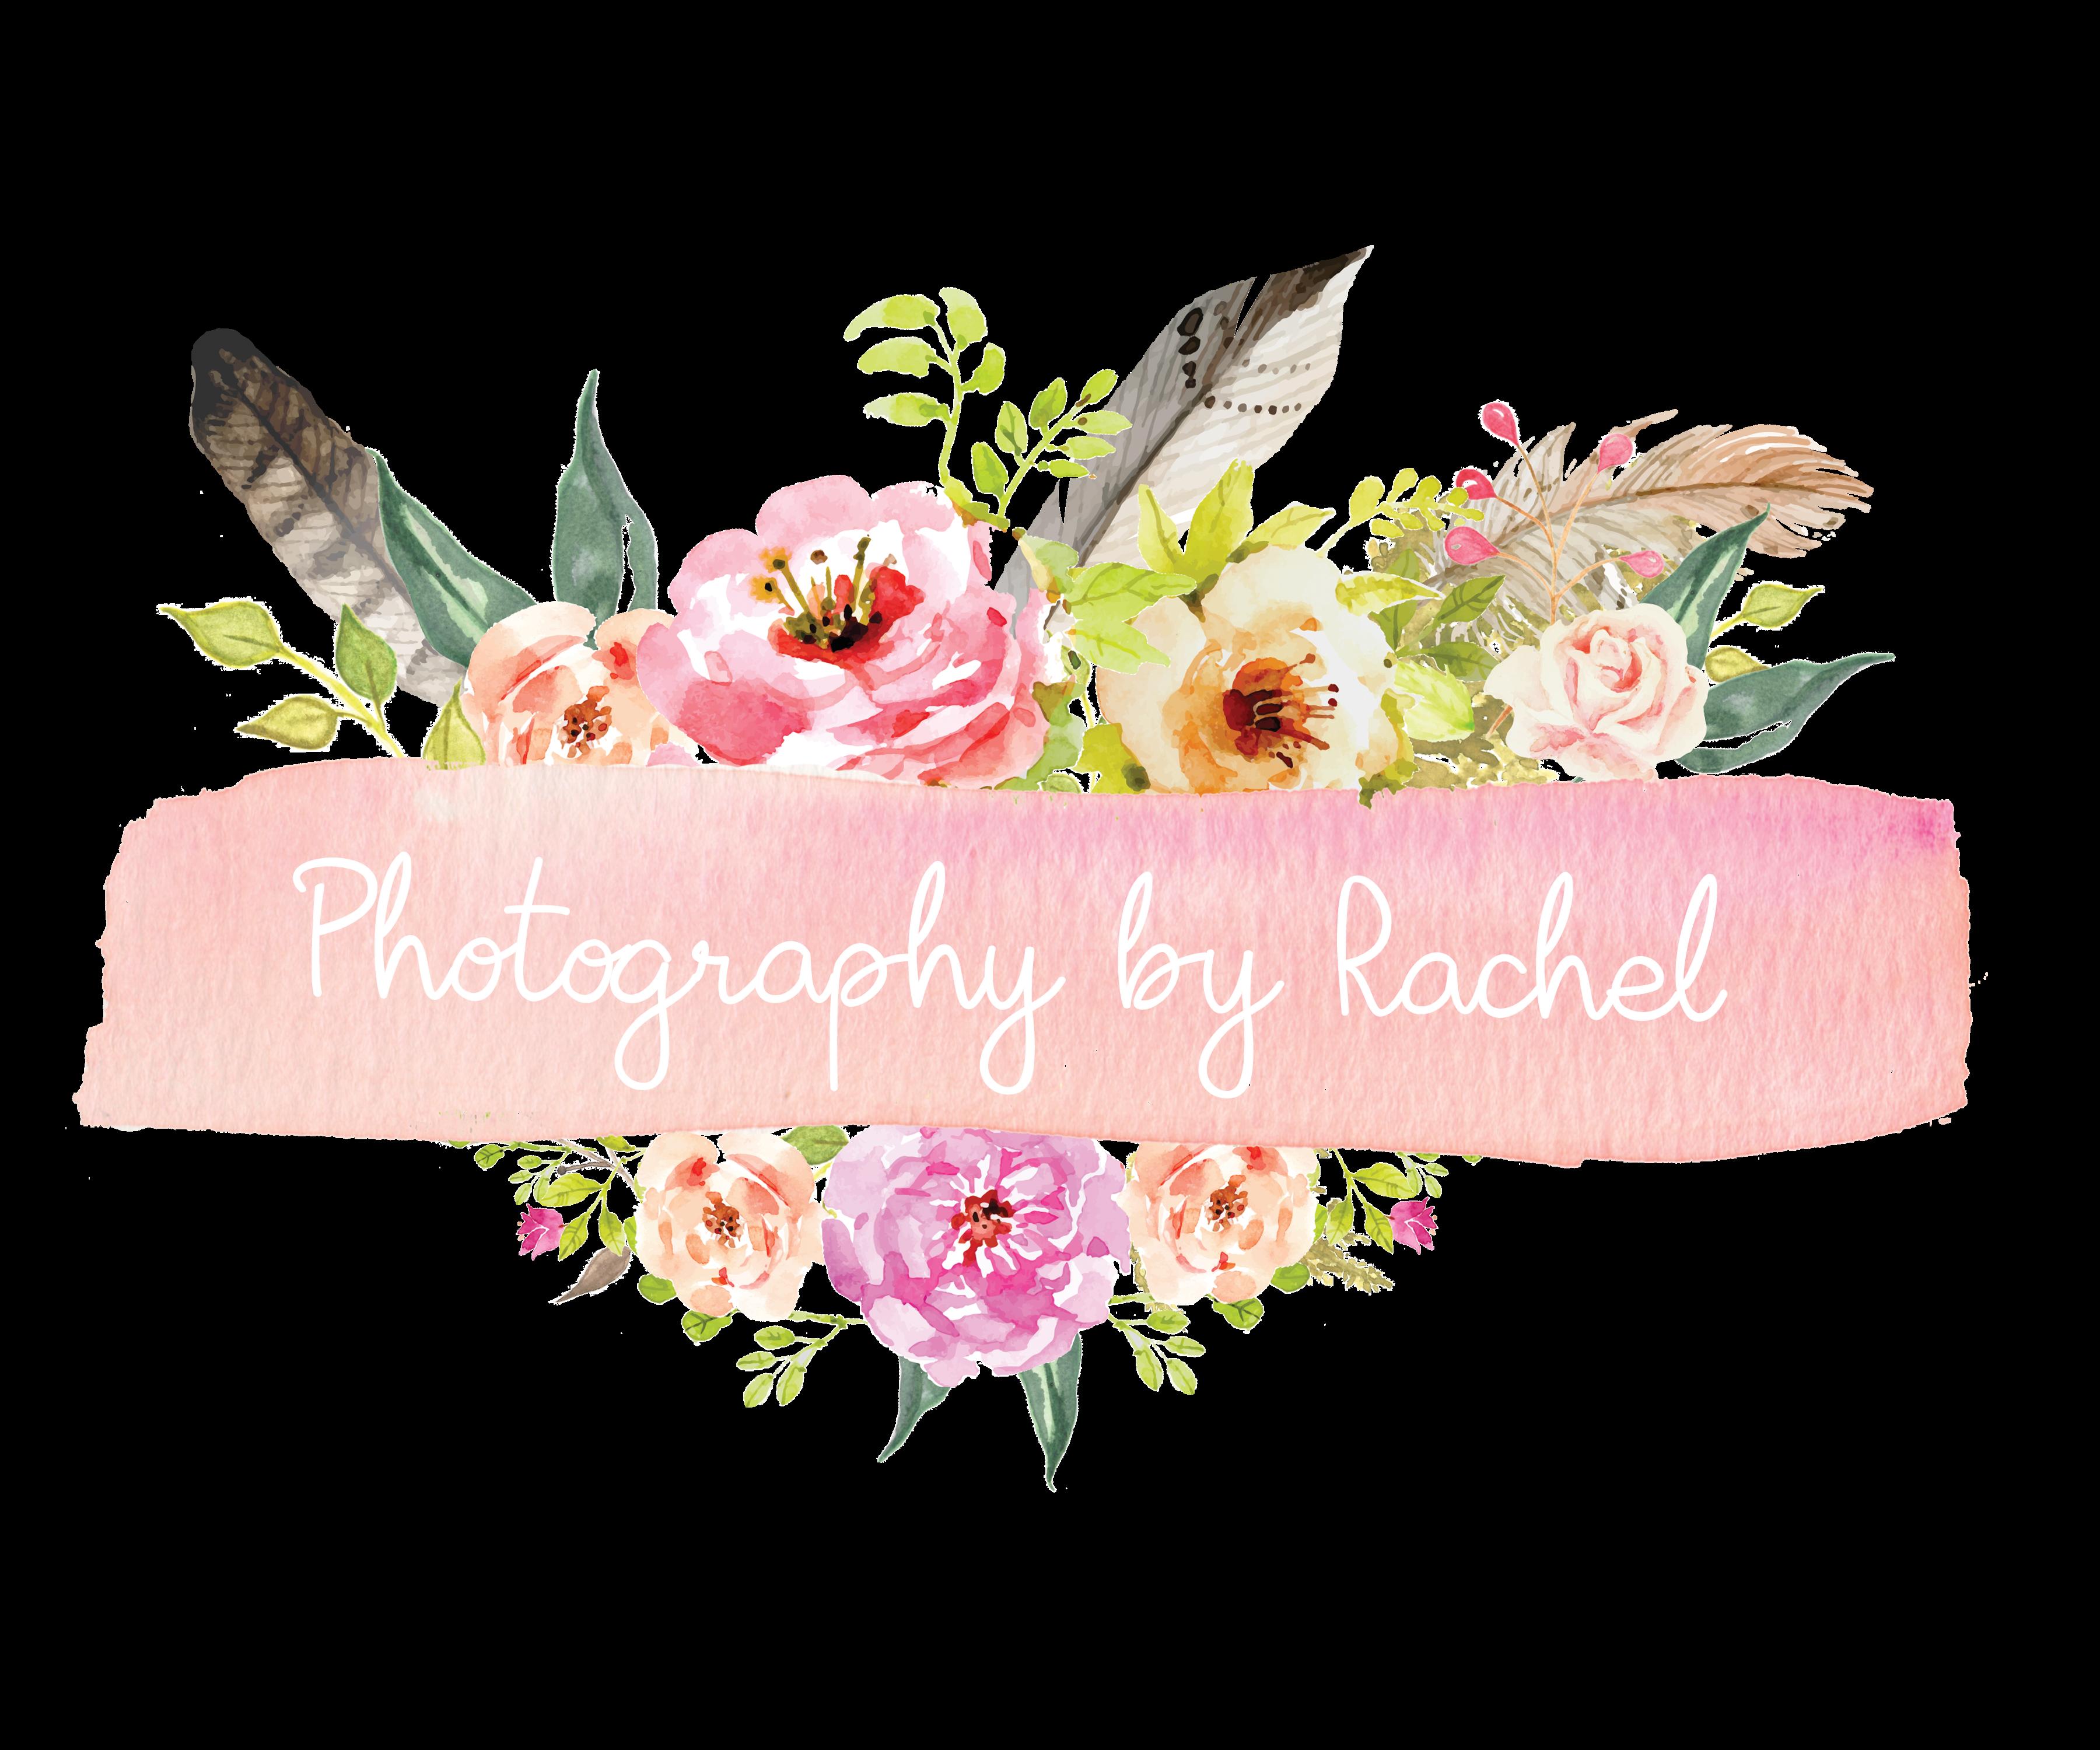 Photography by Rachel